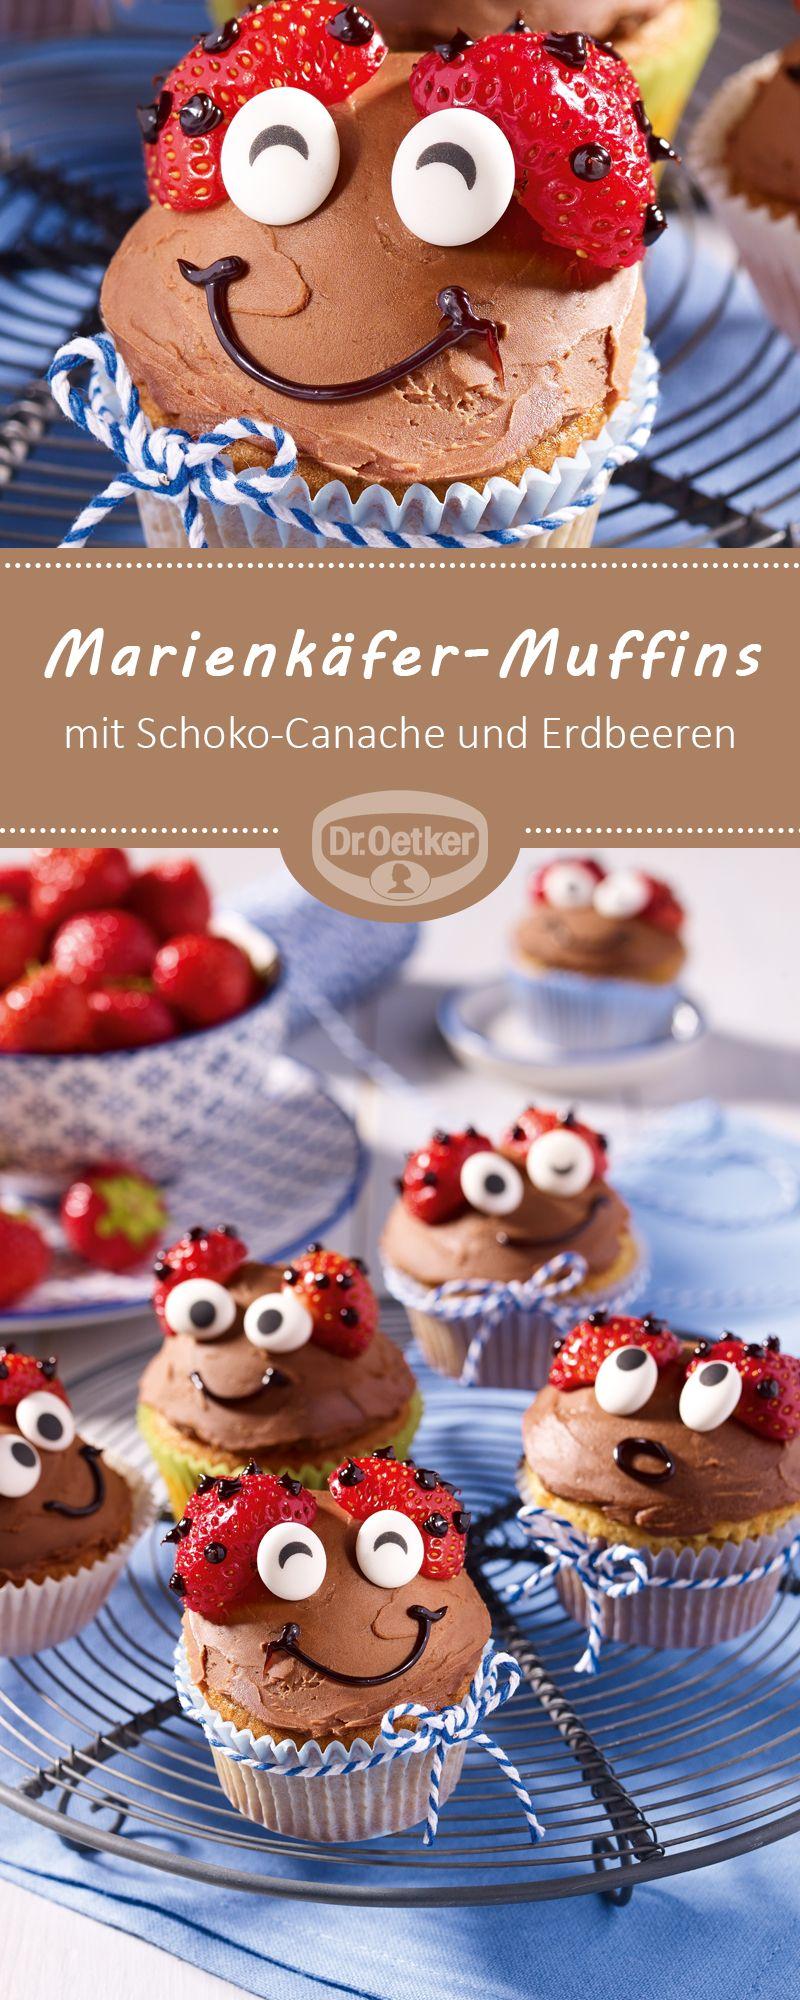 Marienkäfer-Muffins #quickcookies